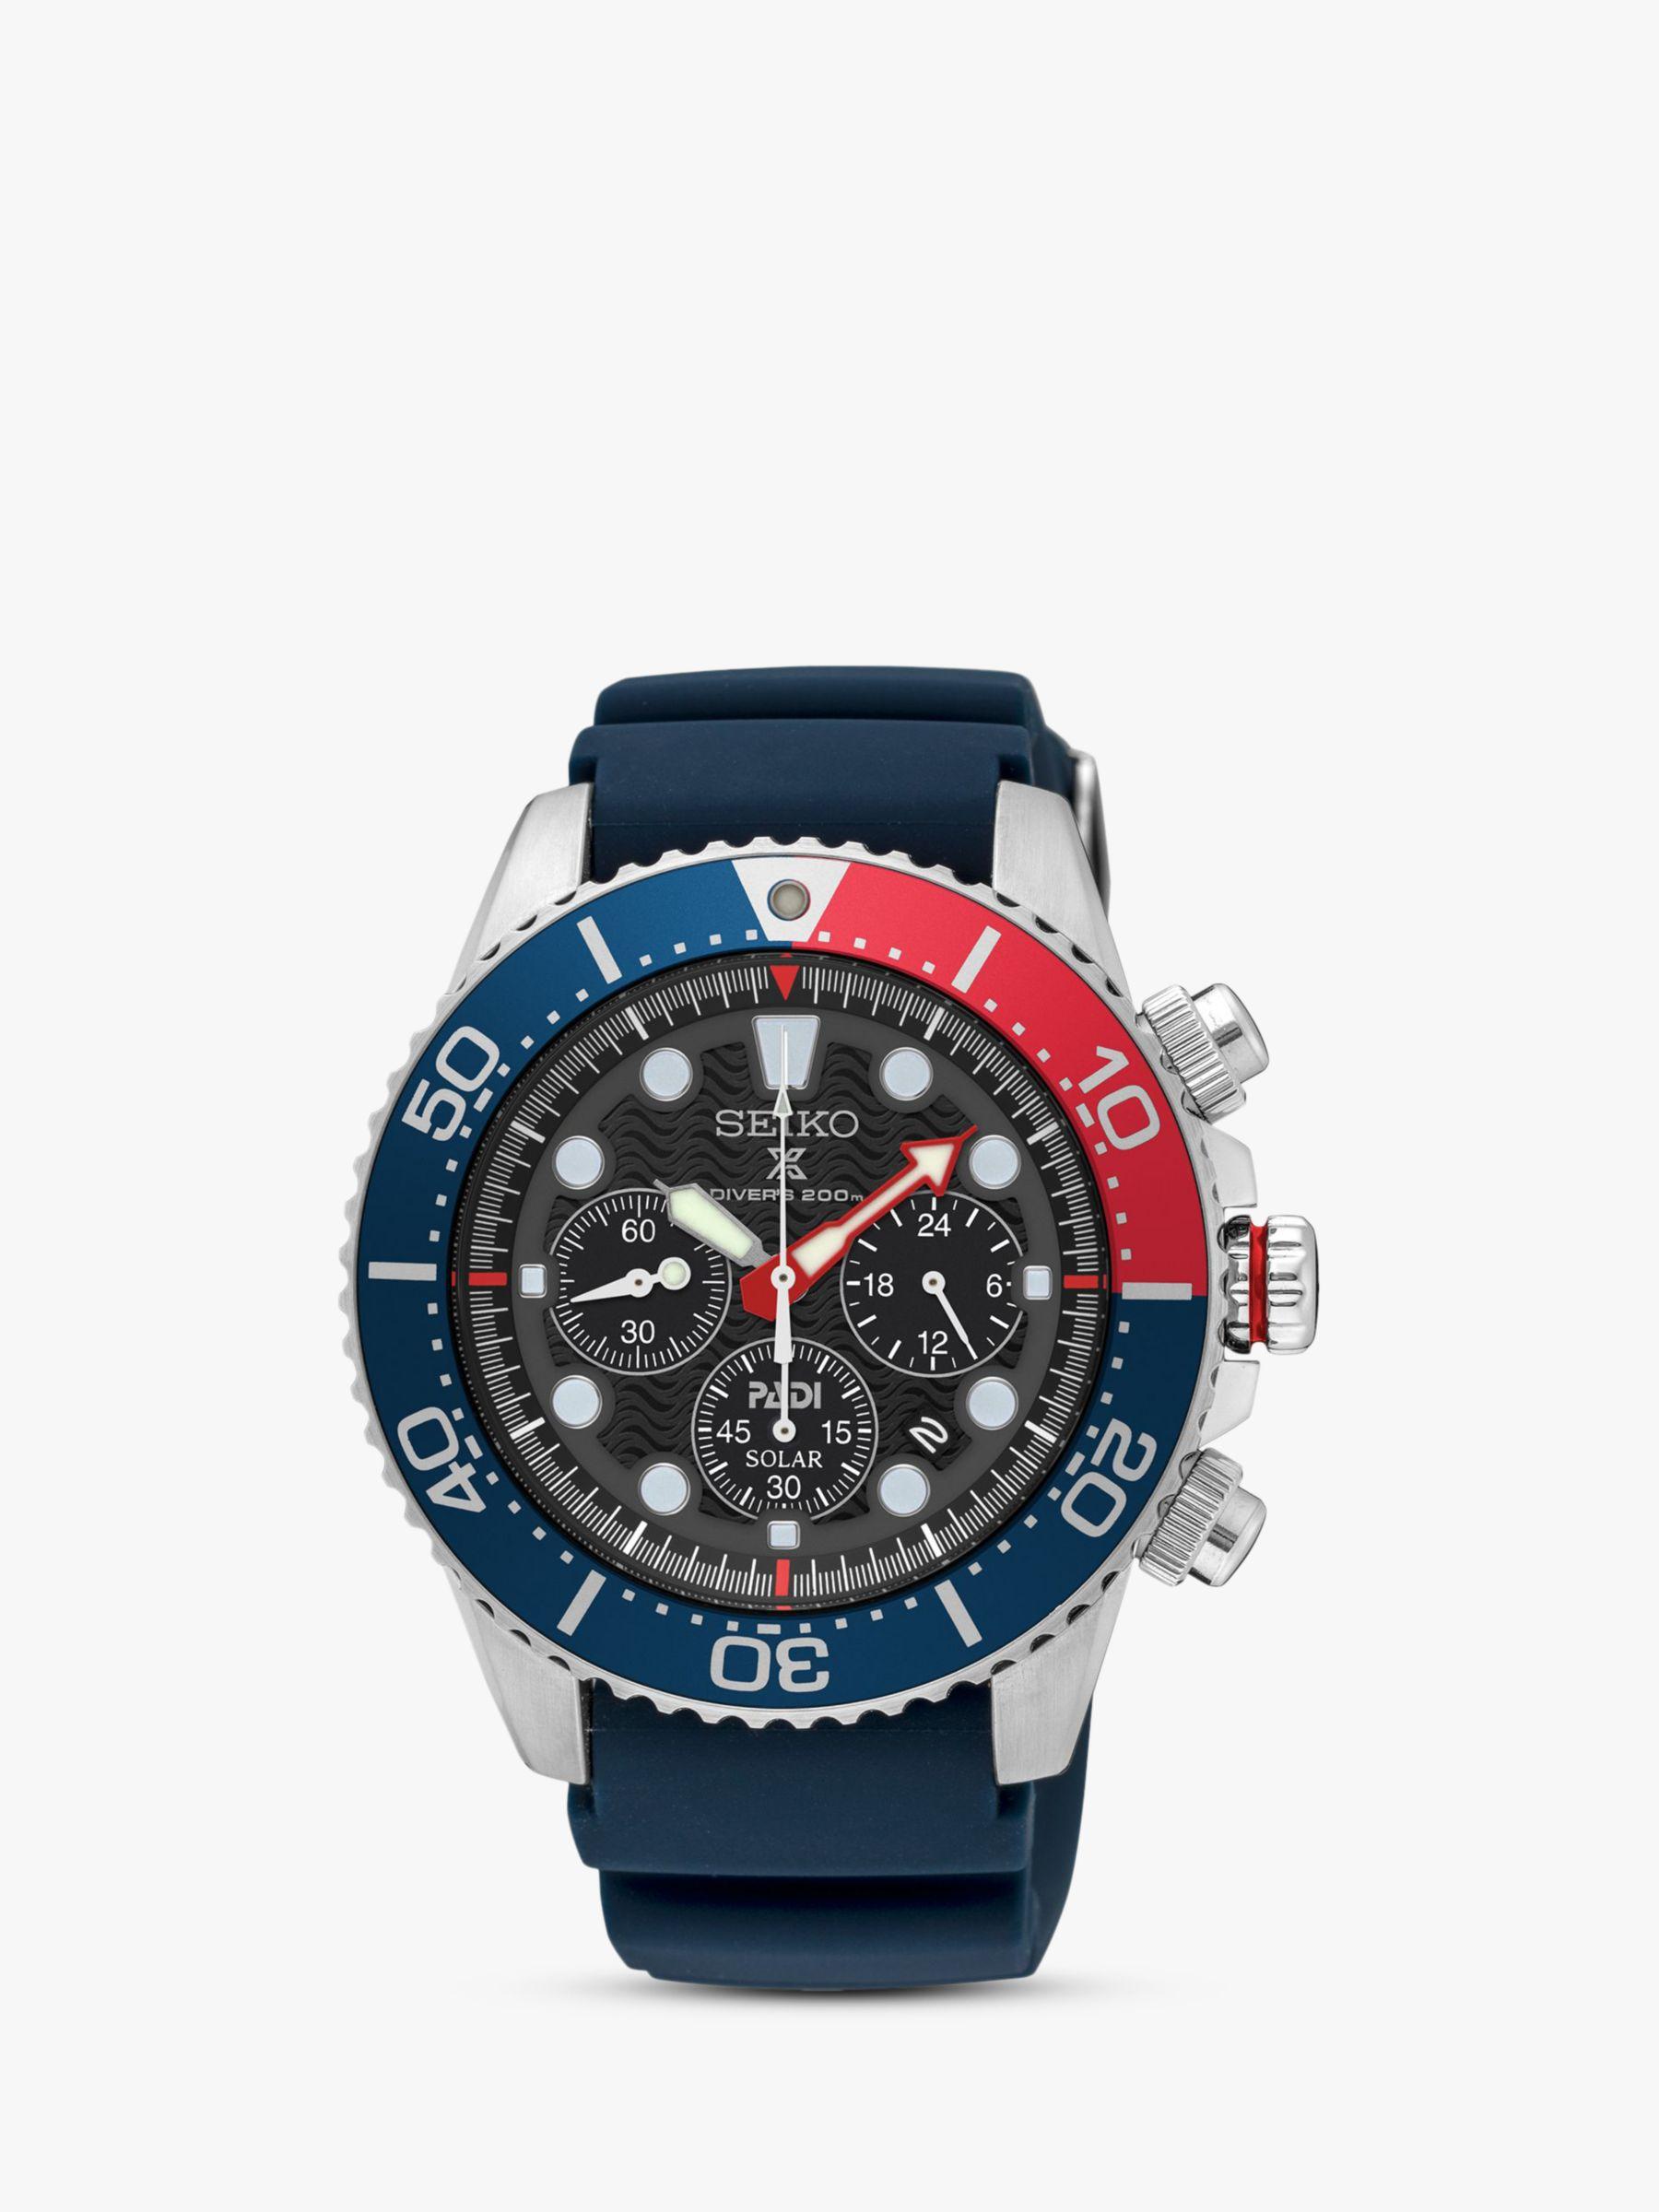 Seiko Seiko SSC663P1 Men's Prospex Divers Solar Chronograph Date Silicone Strap Watch, Navy/Black